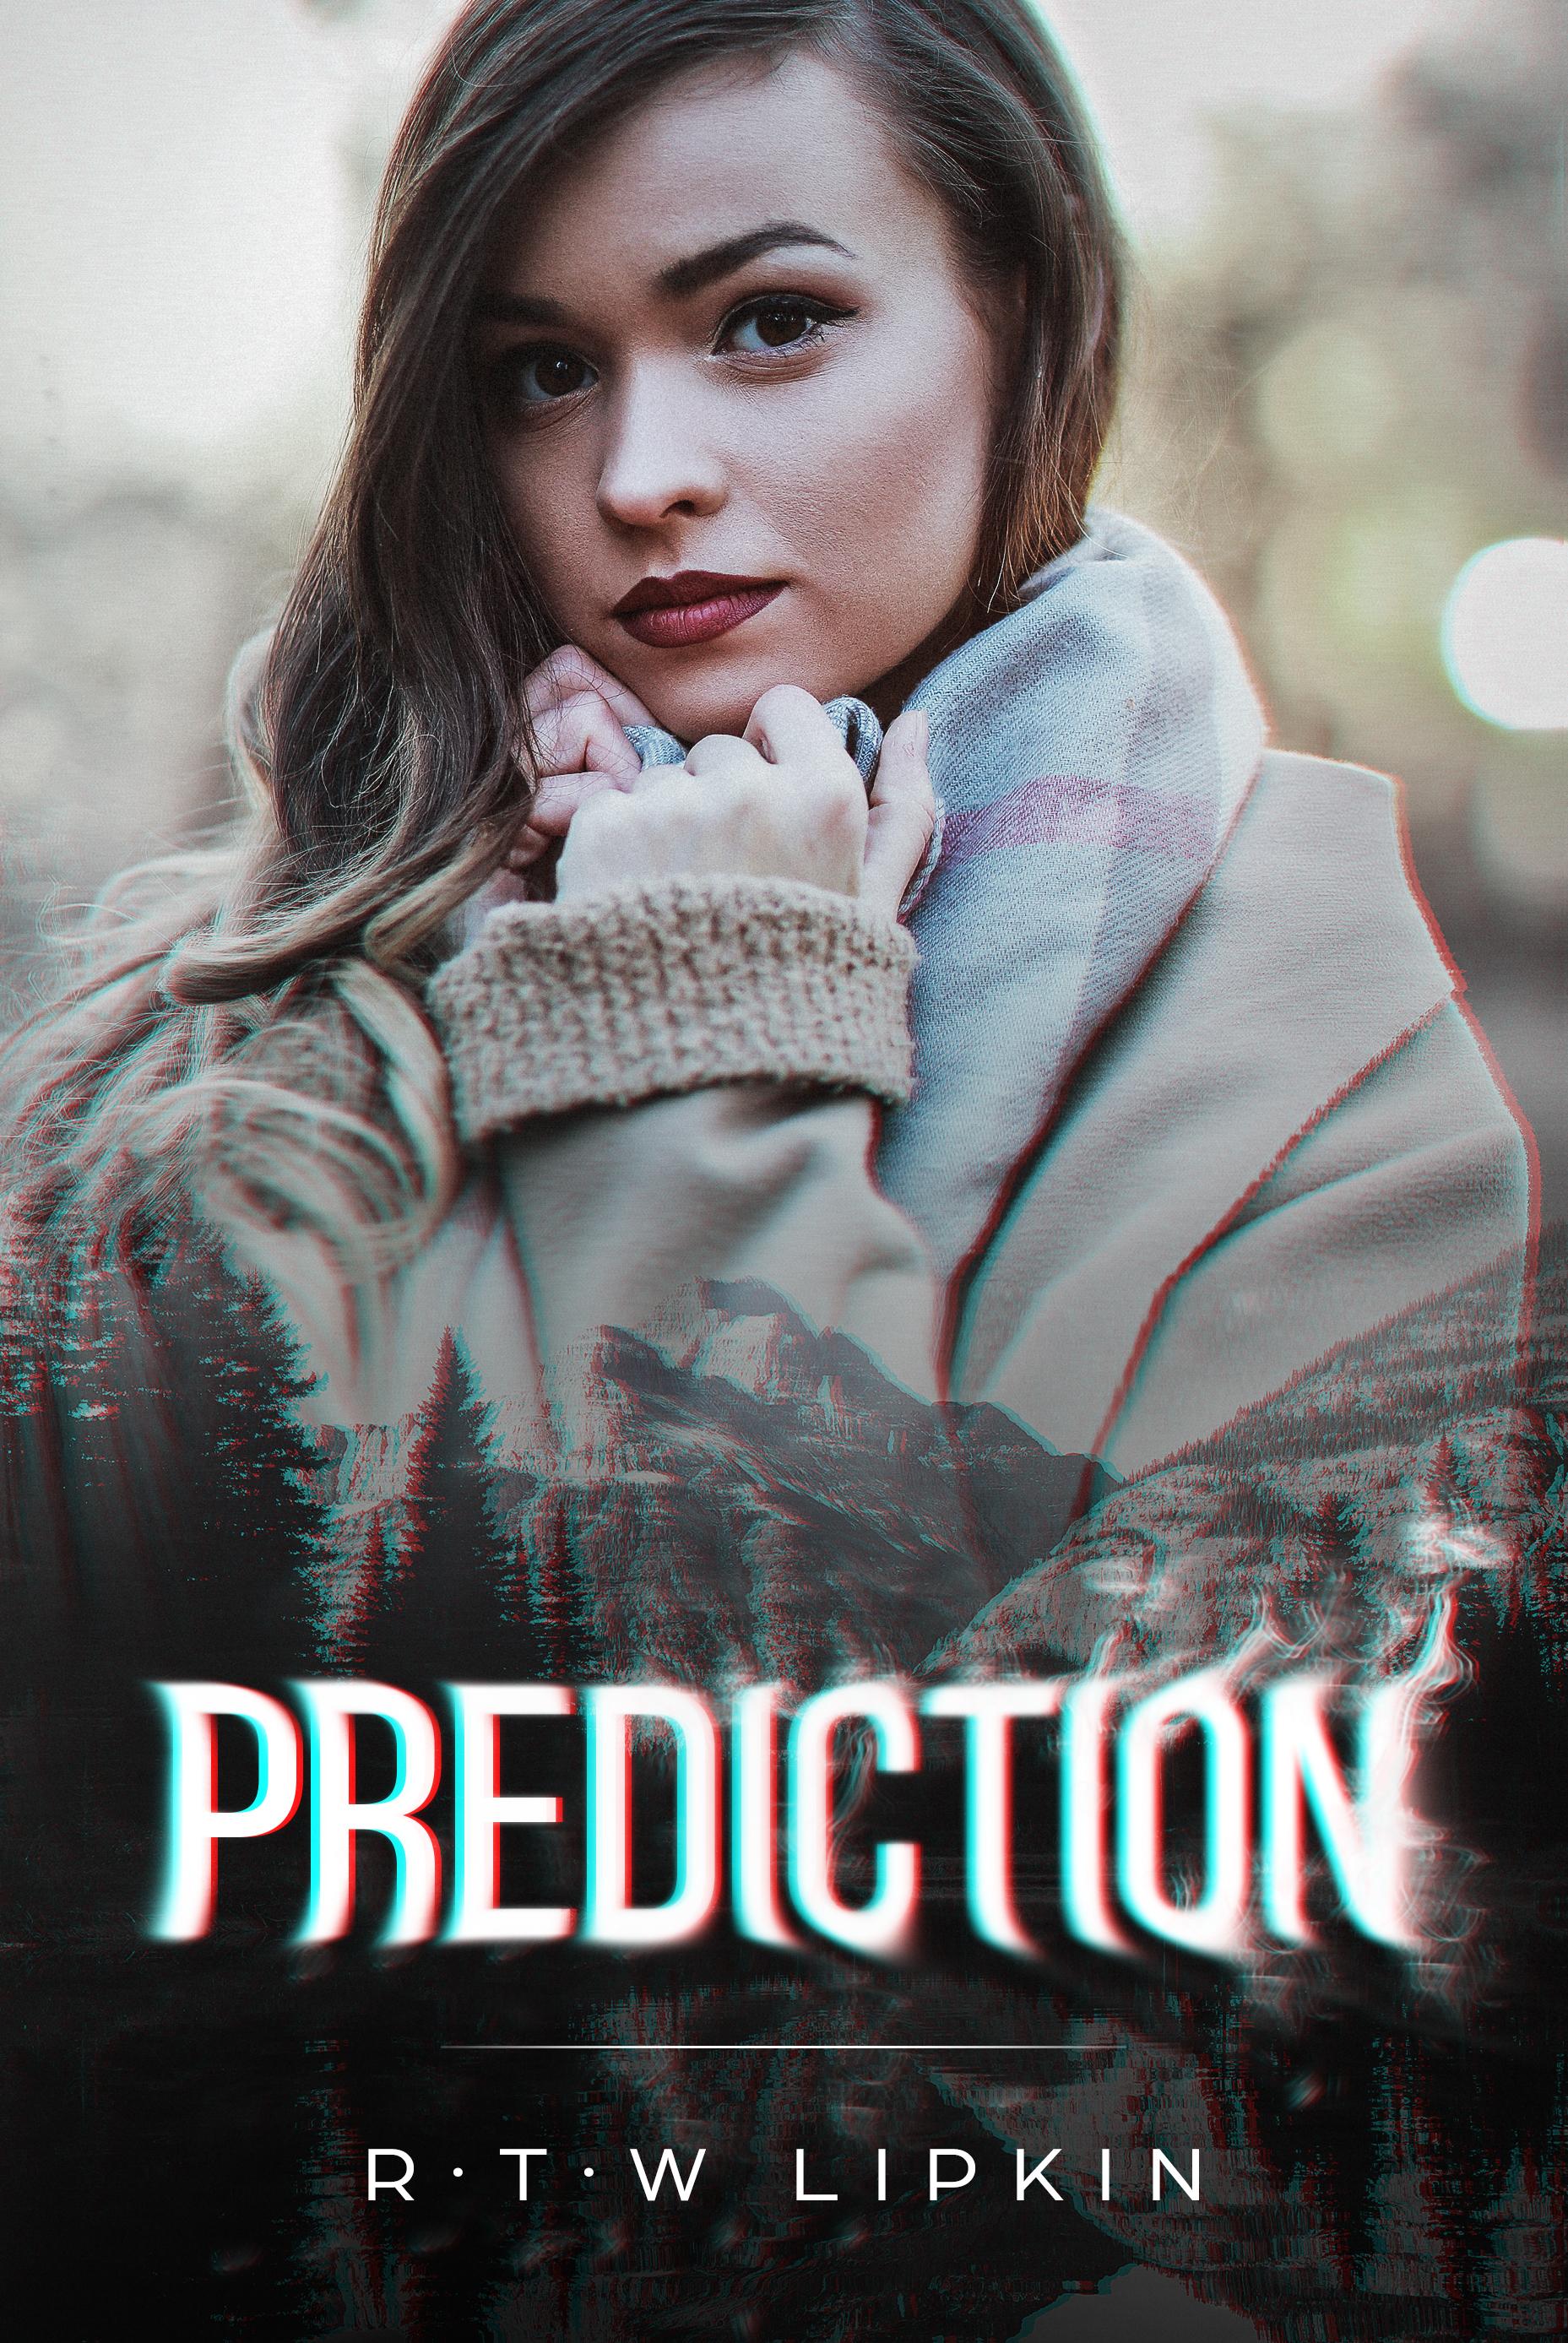 Prediction ebook cover version 2